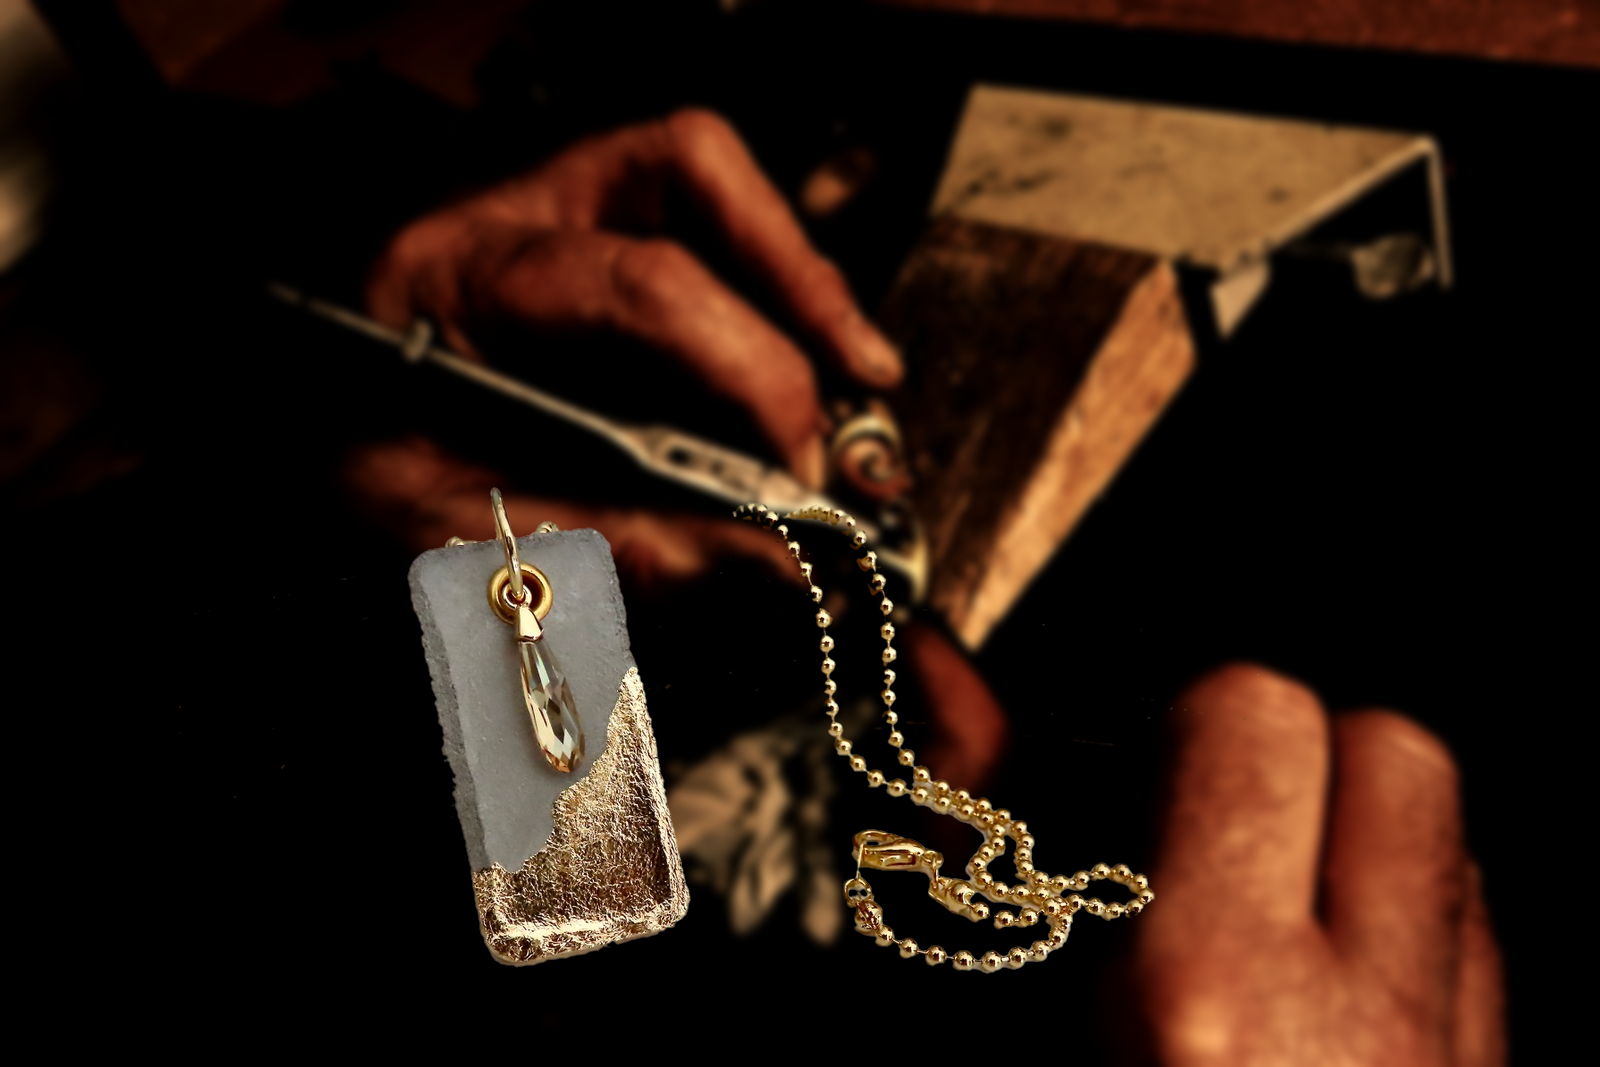 fabrication-bijoux-artisanaux-collier-or